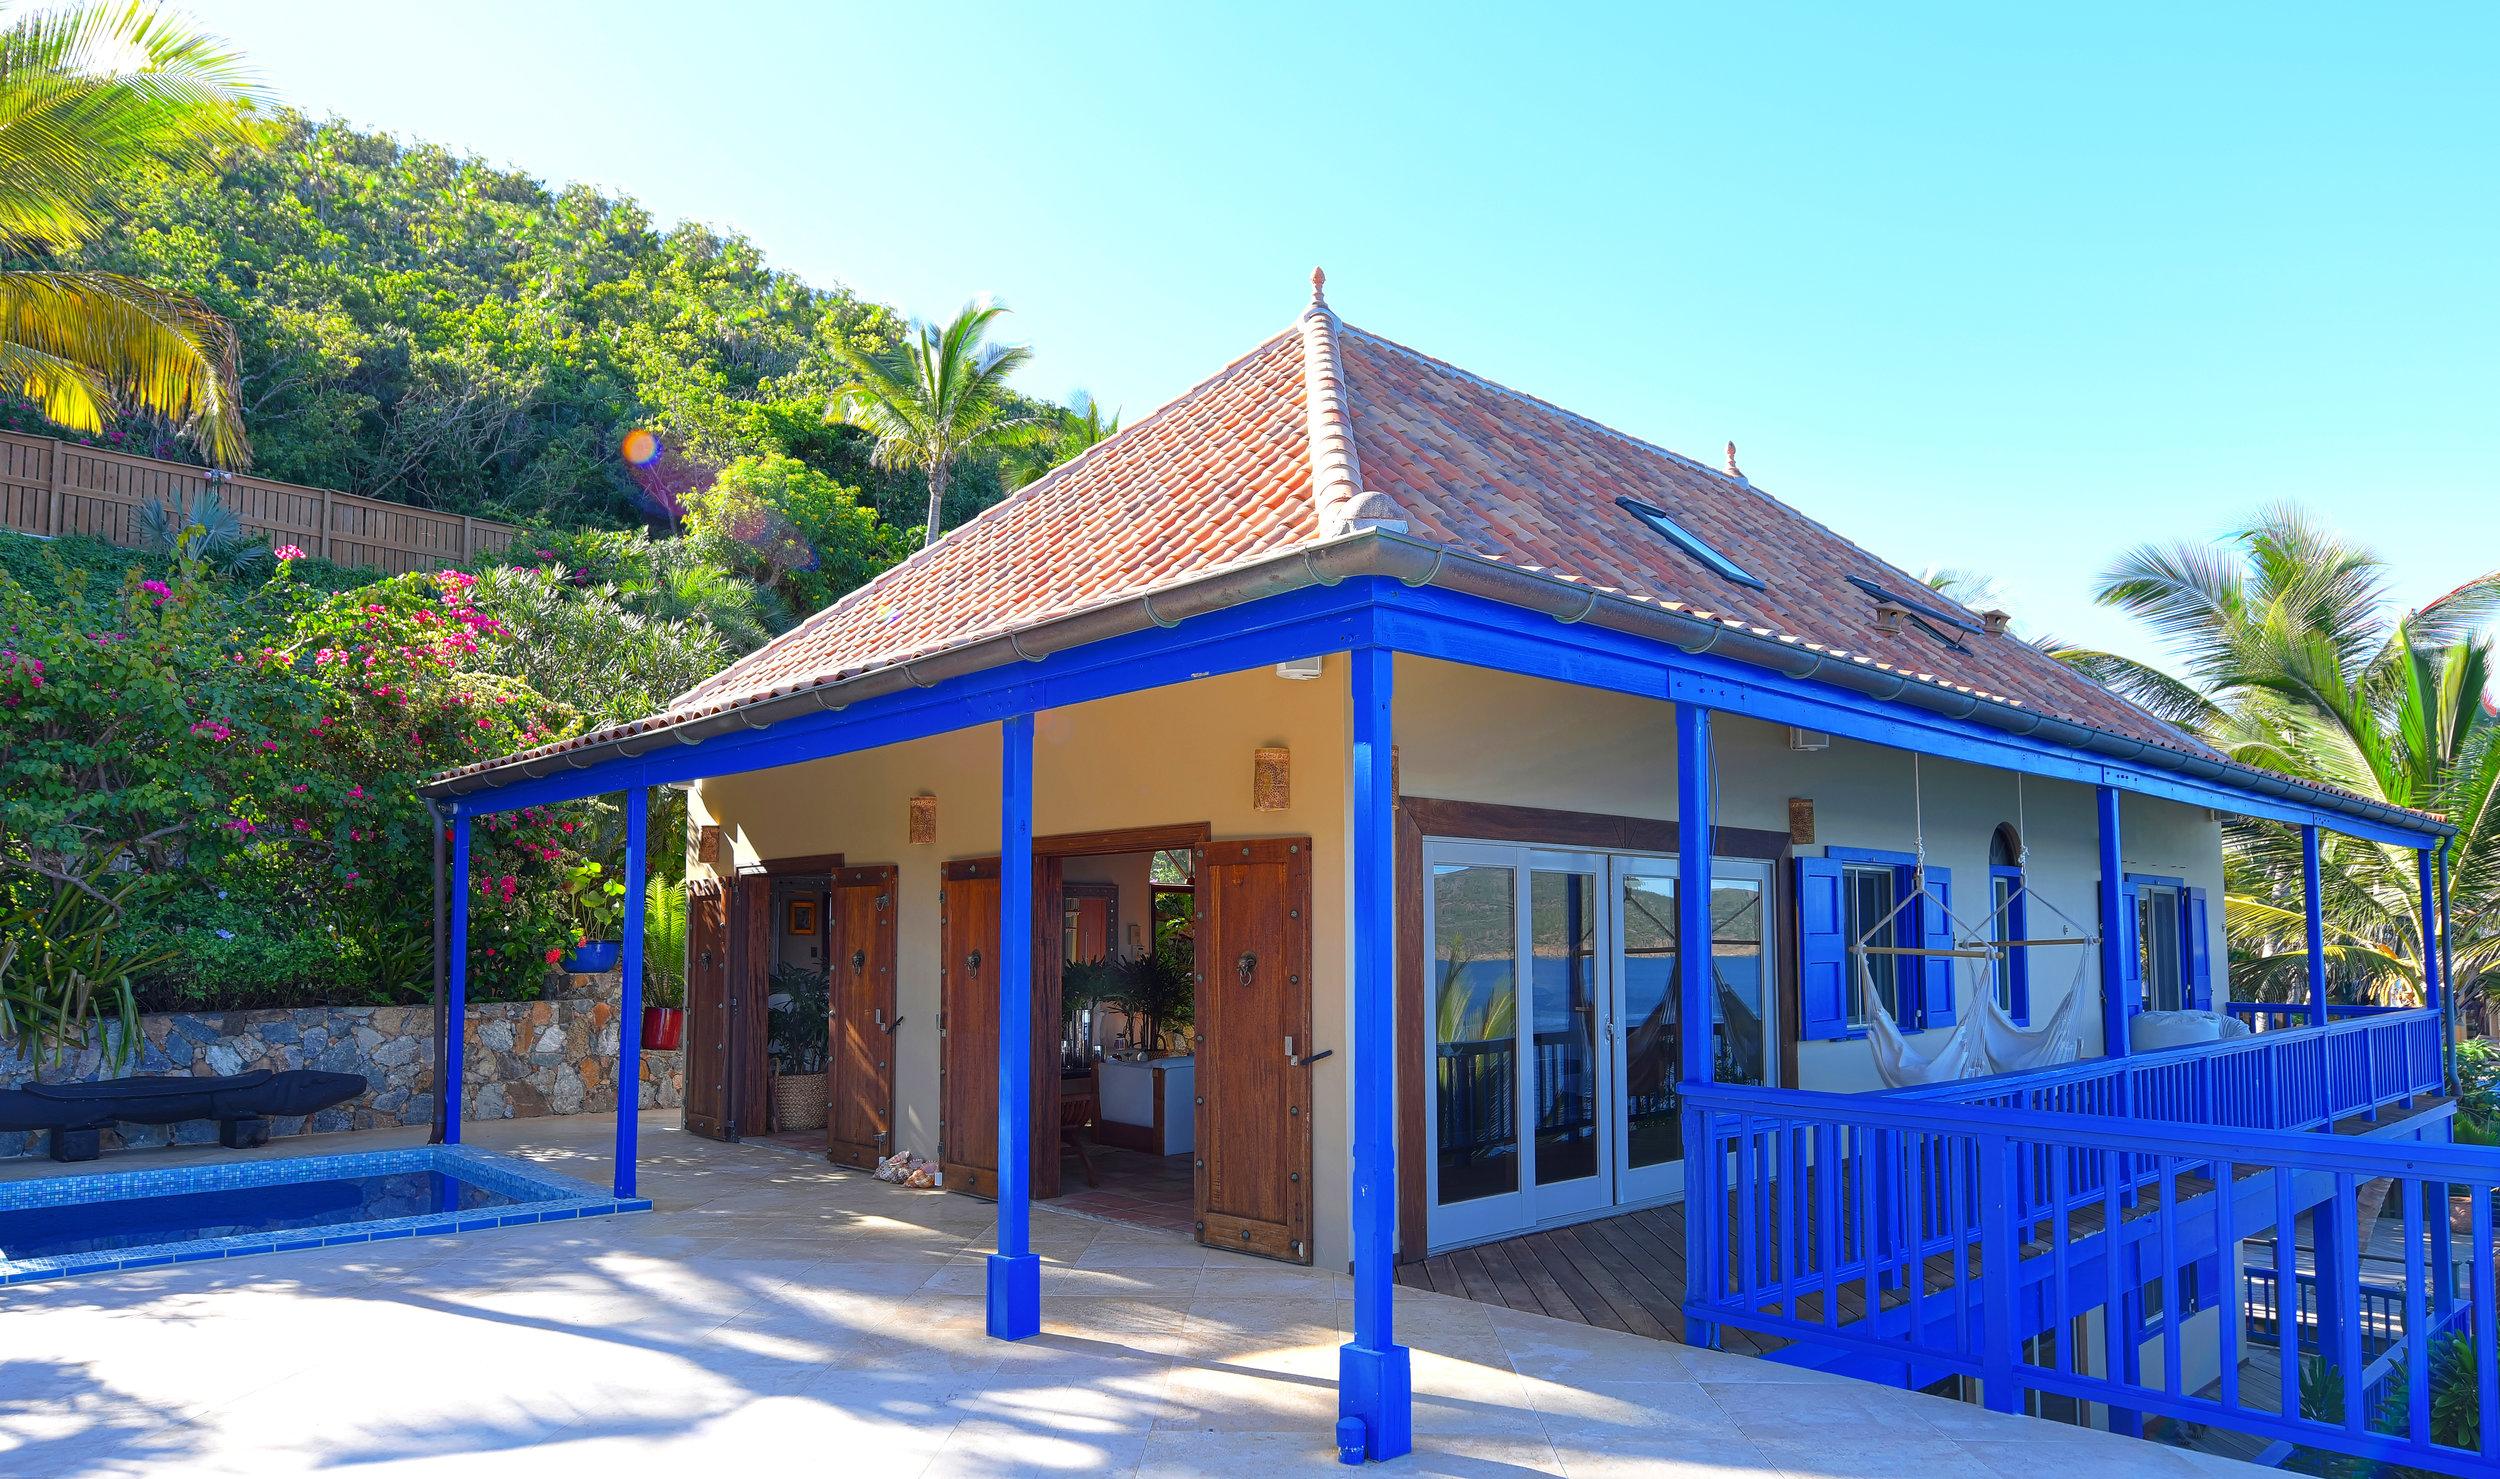 Boutique Villas - Best Villas in the USVI - Blue Glass Photography